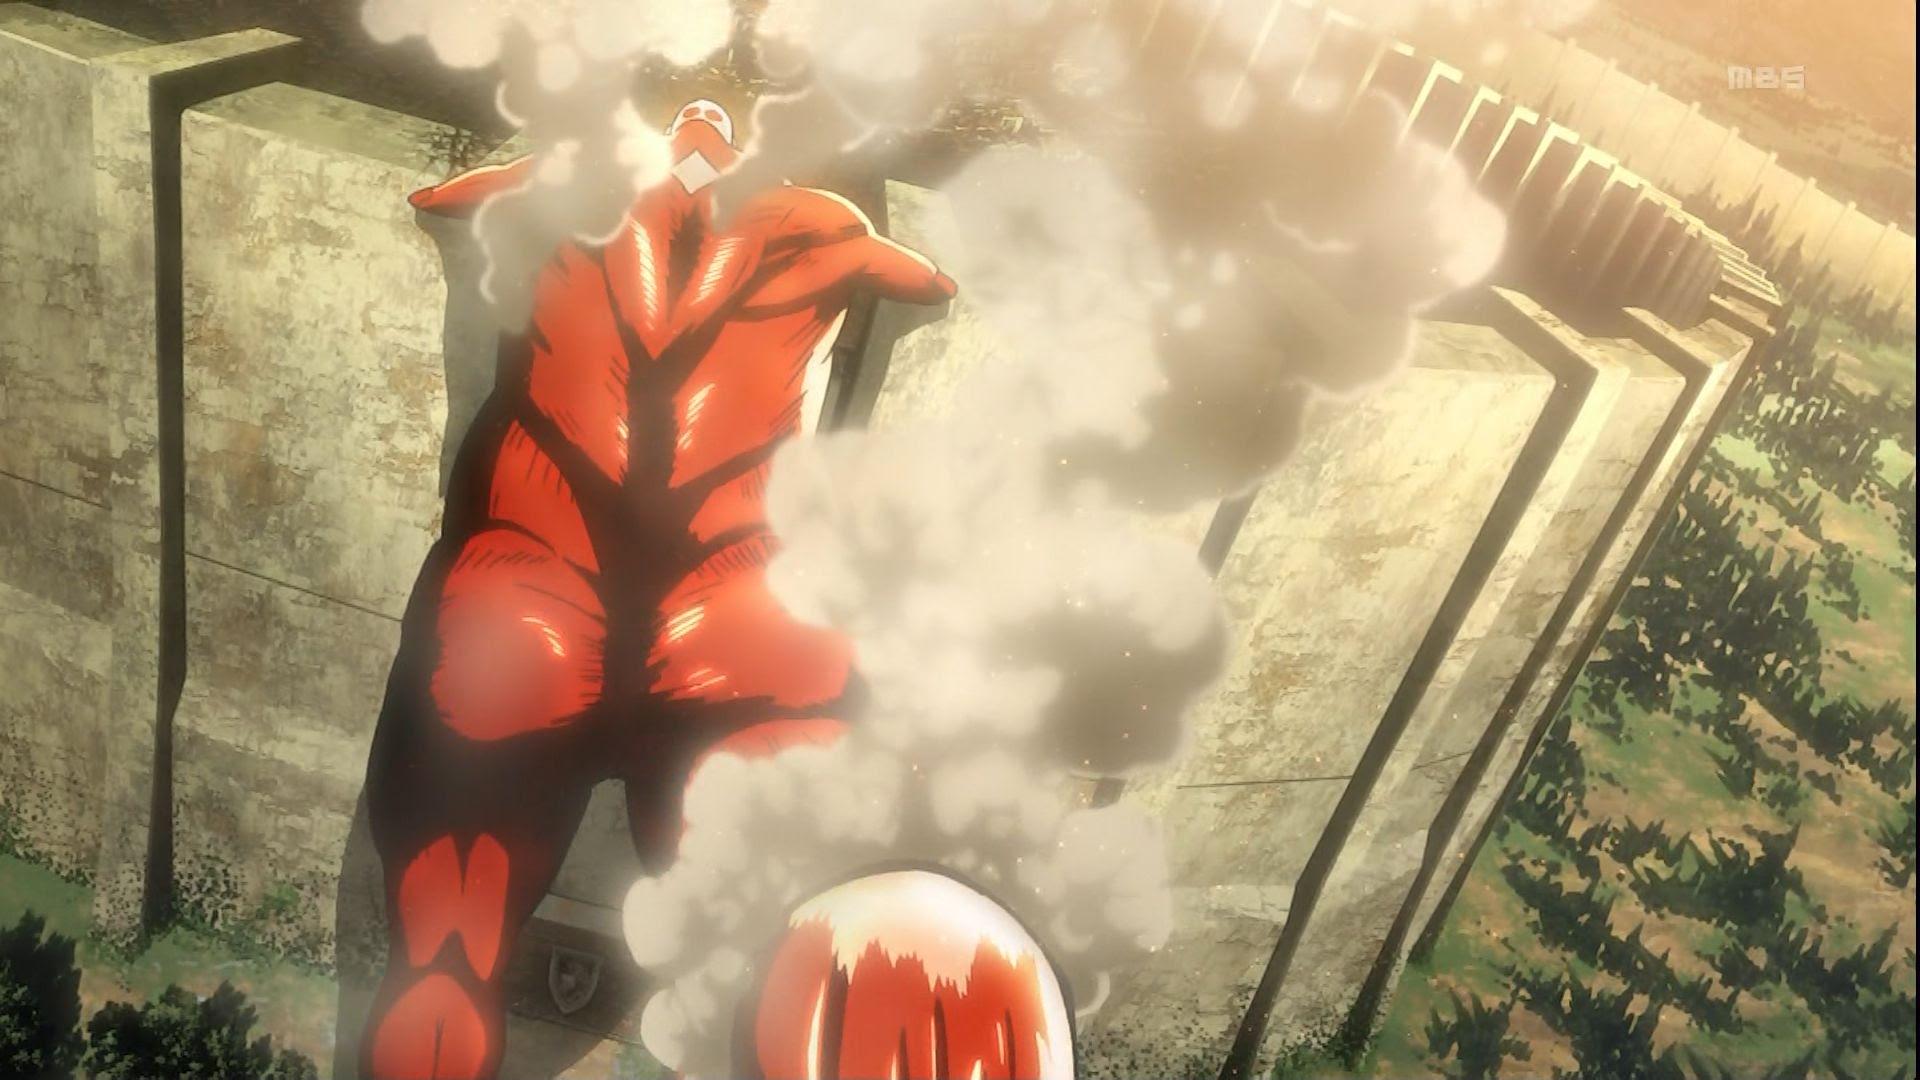 Attack On Titan Episode 1 One Pixel Jump